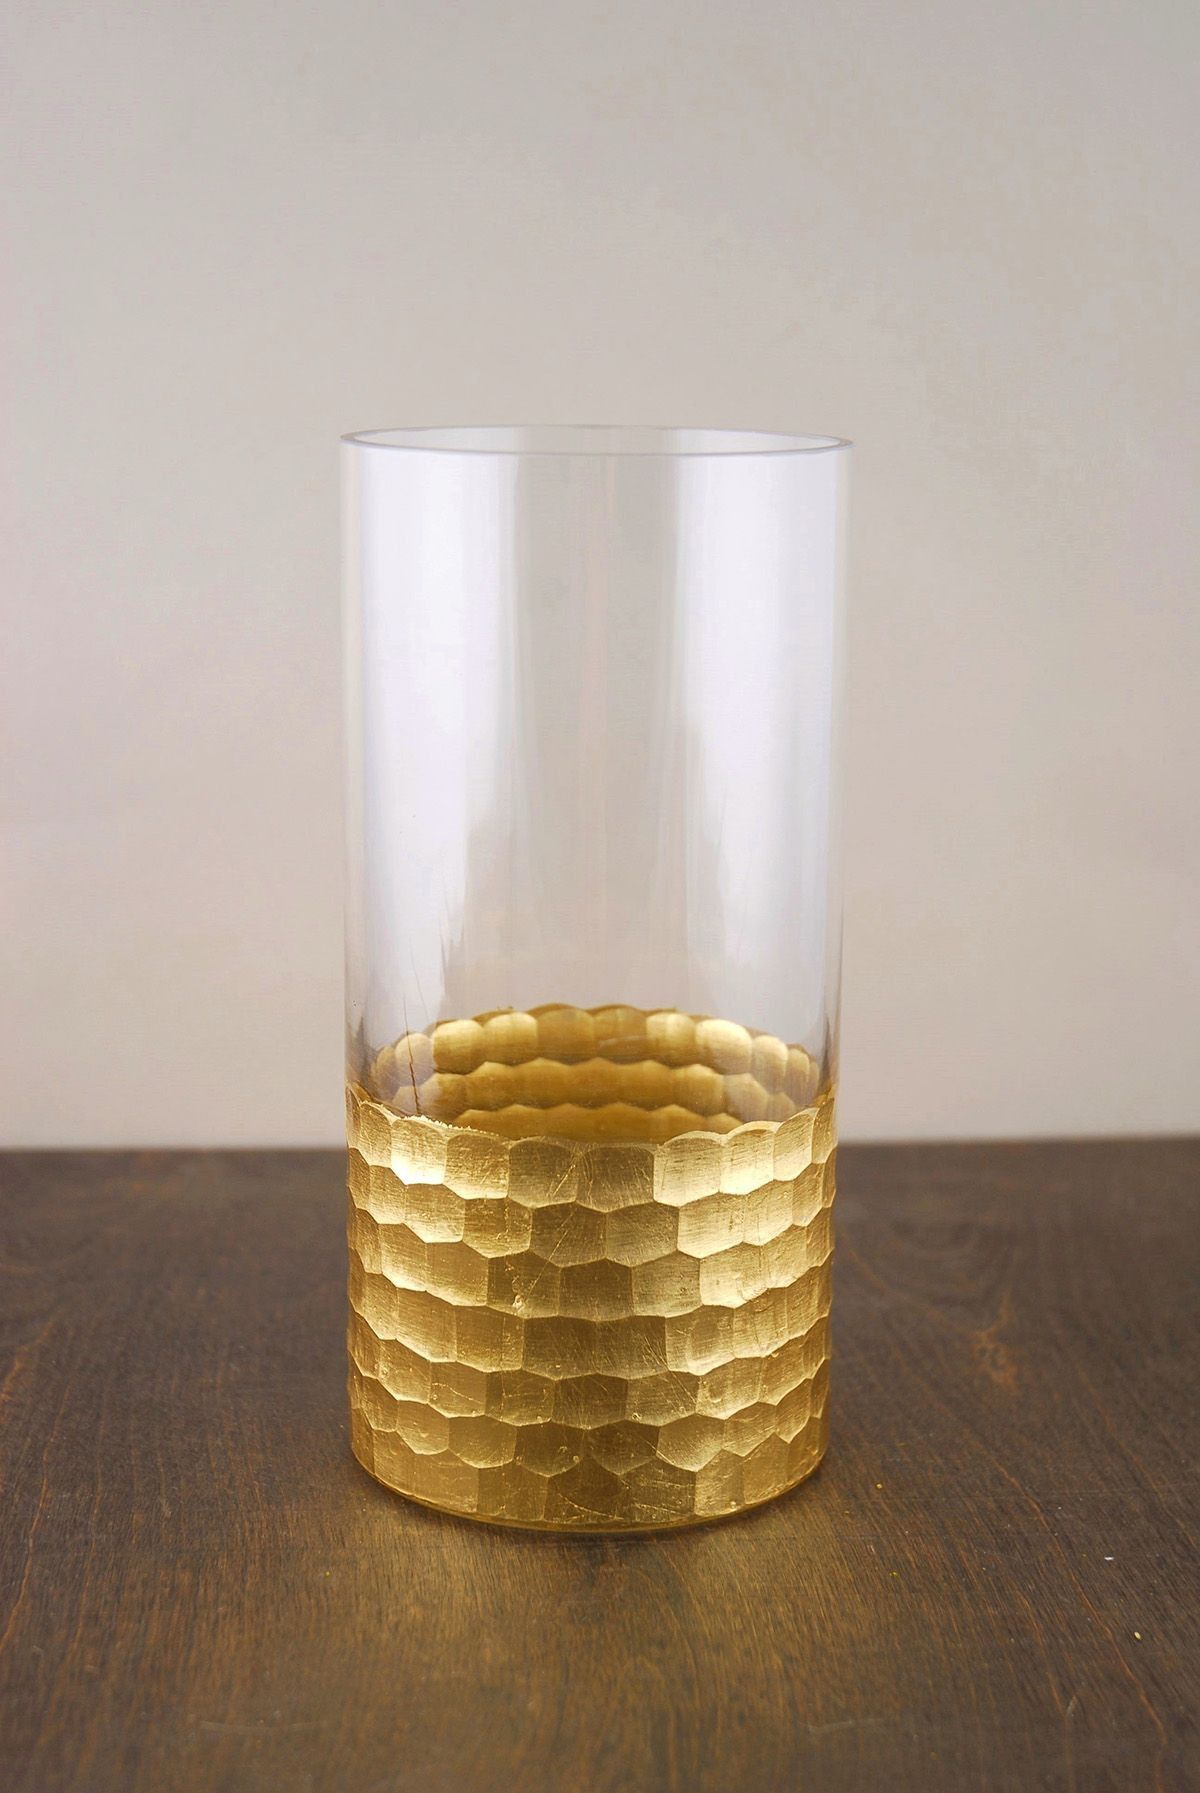 hurricane vases michaels of gold mercury glass vases inspirational gold cylinder vases inside gold mercury glass vases inspirational gold cylinder vases collection silver and gold mercury gl